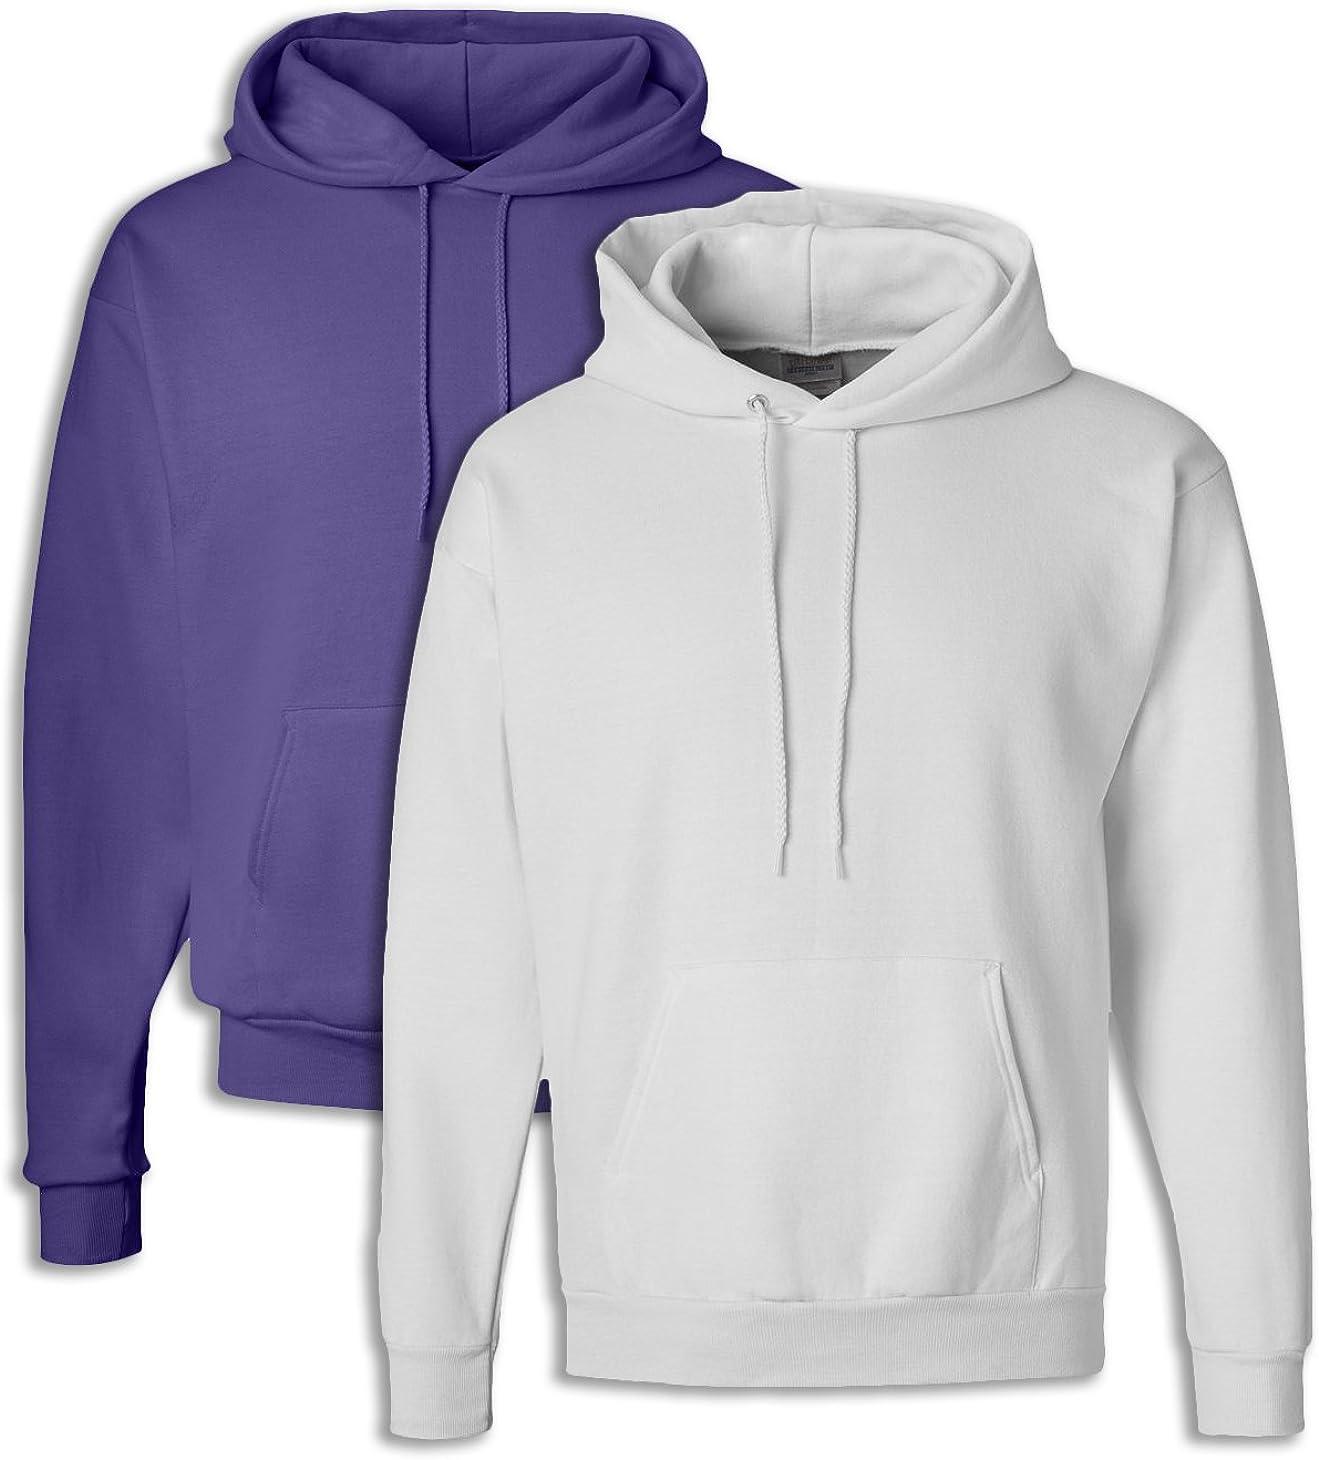 Hanes P170 Mens EcoSmart Hooded Sweatshirt XL 1 Safety Green 1 Smoke Grey